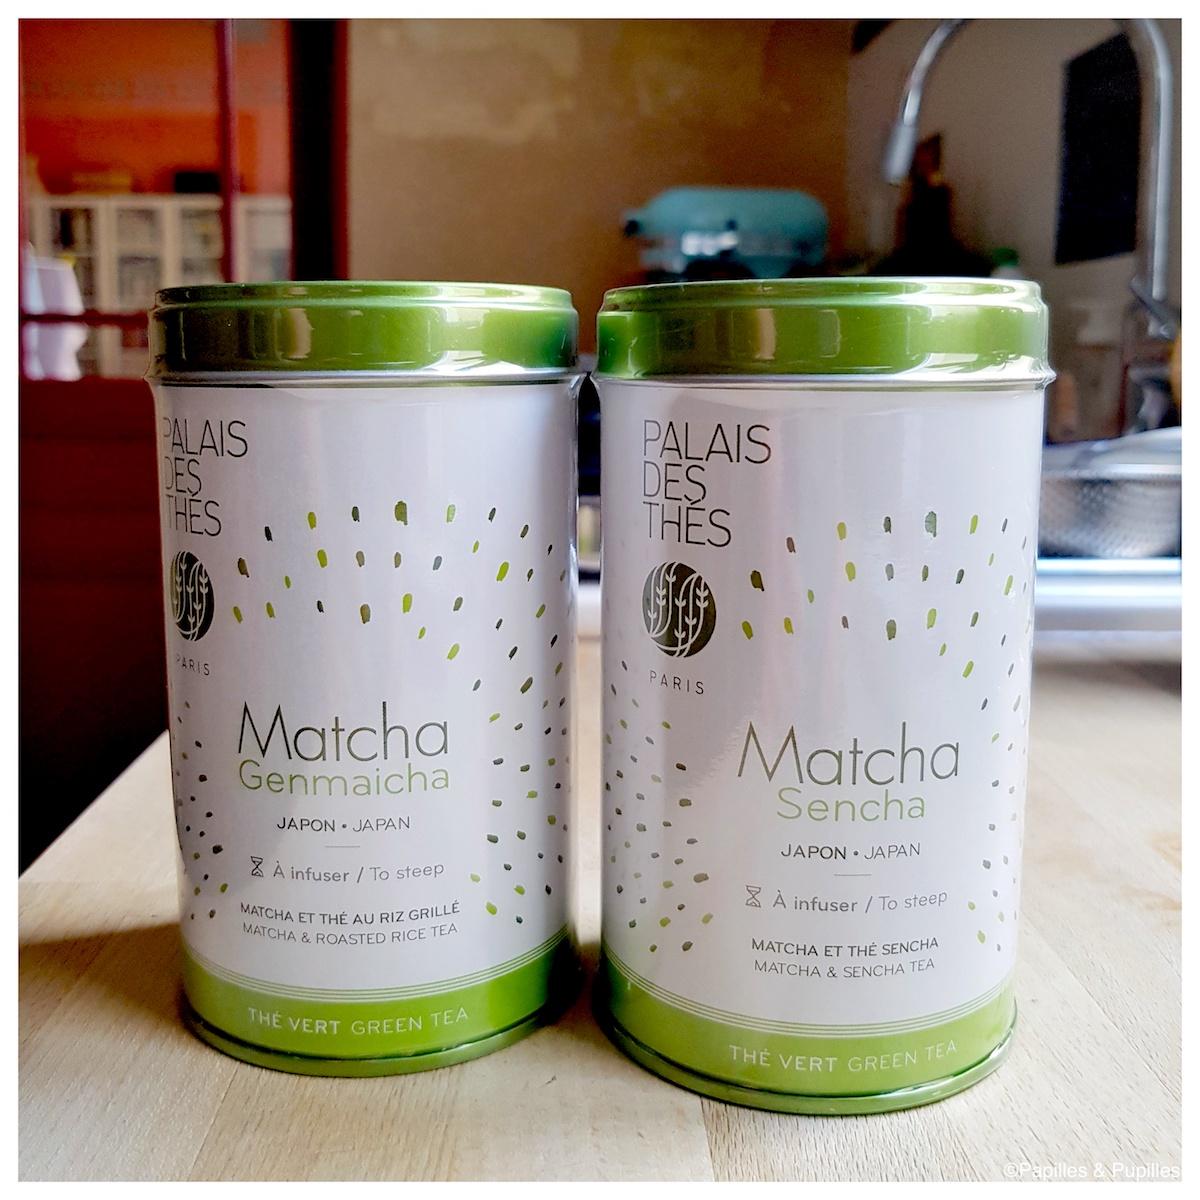 Matcha - Palais des thés